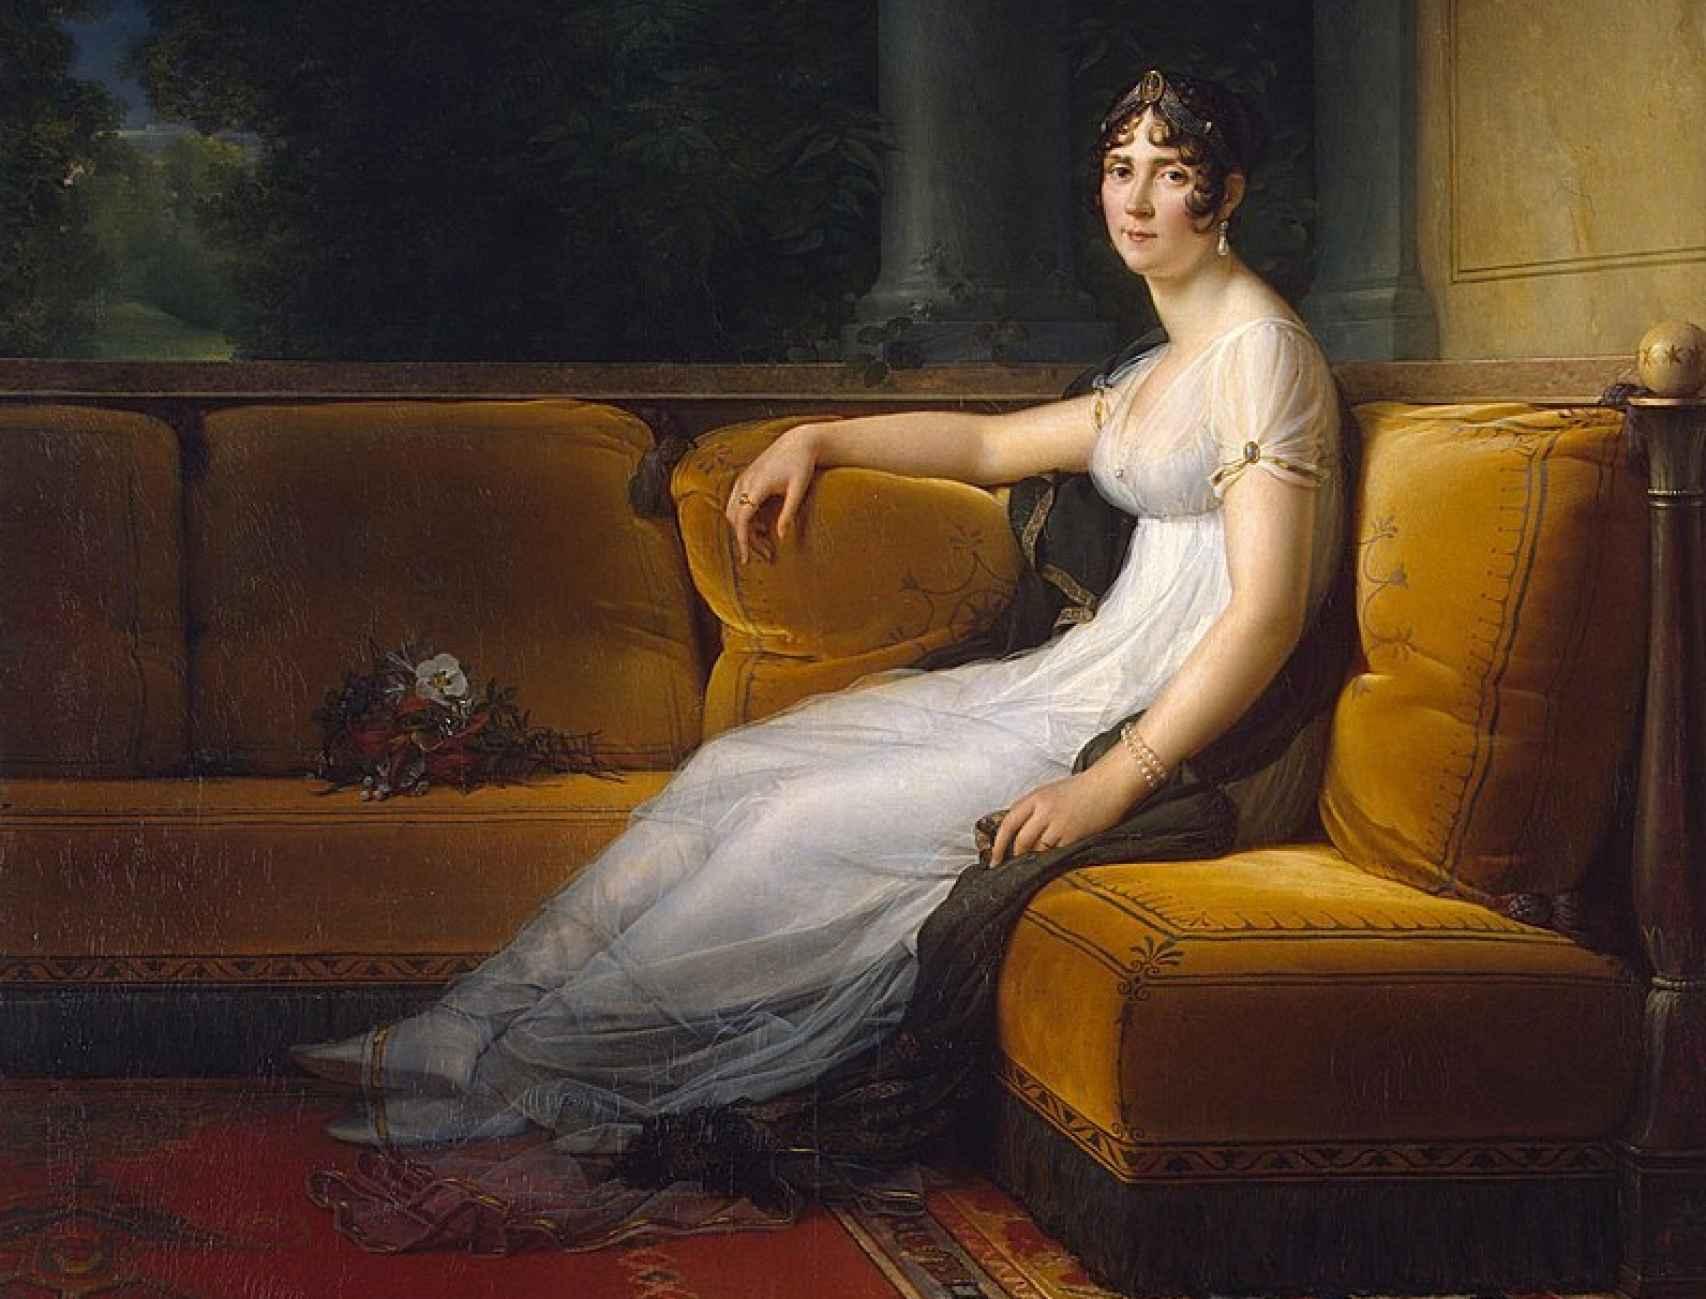 Retrato de la emperatriz Josefina Bonaparte, por François Gérard.